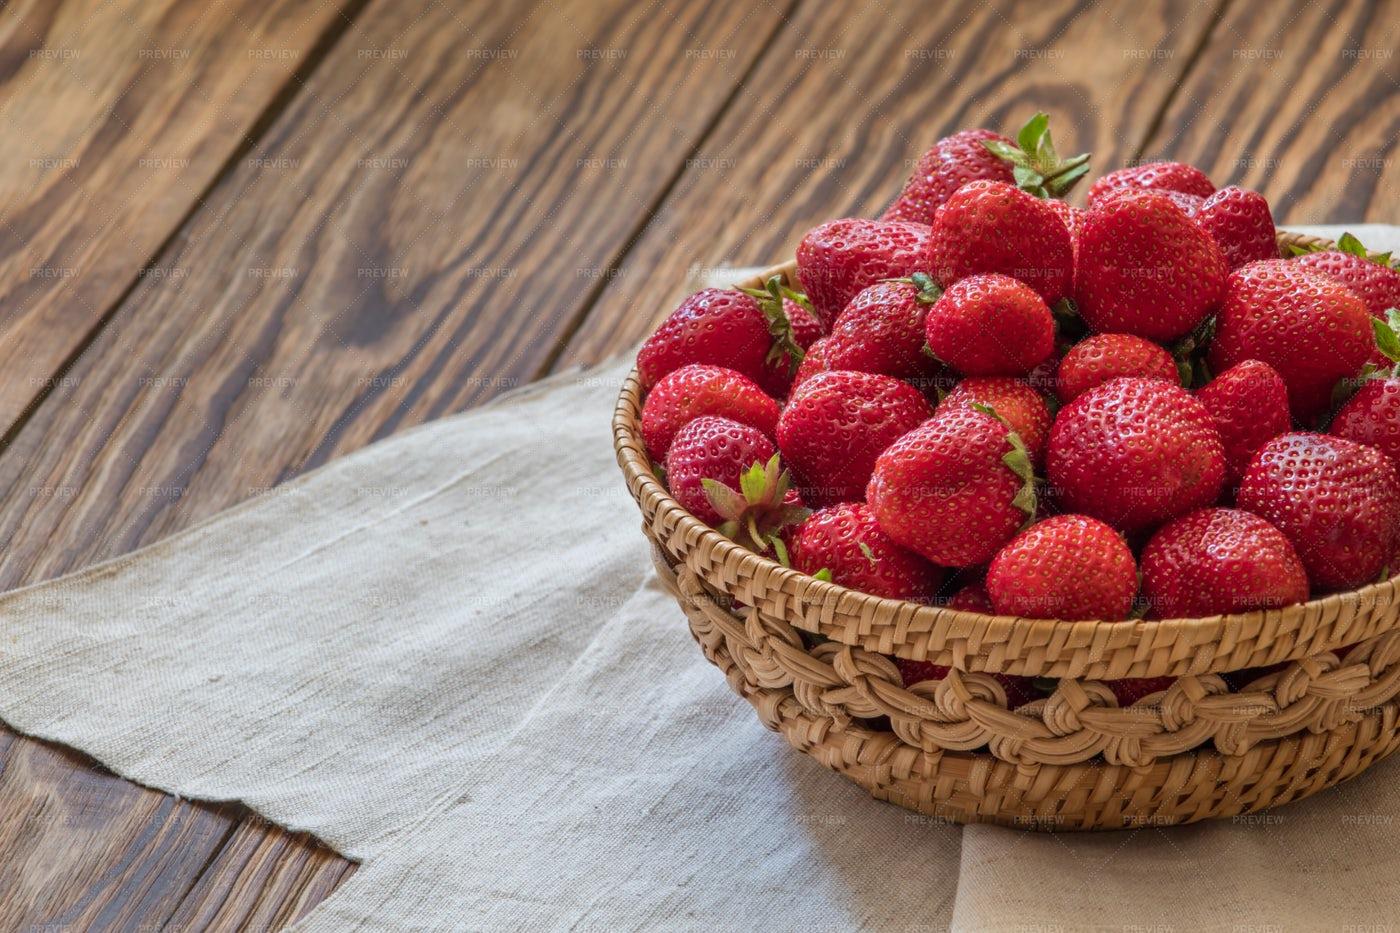 Basket With Tasty Strawberries: Stock Photos